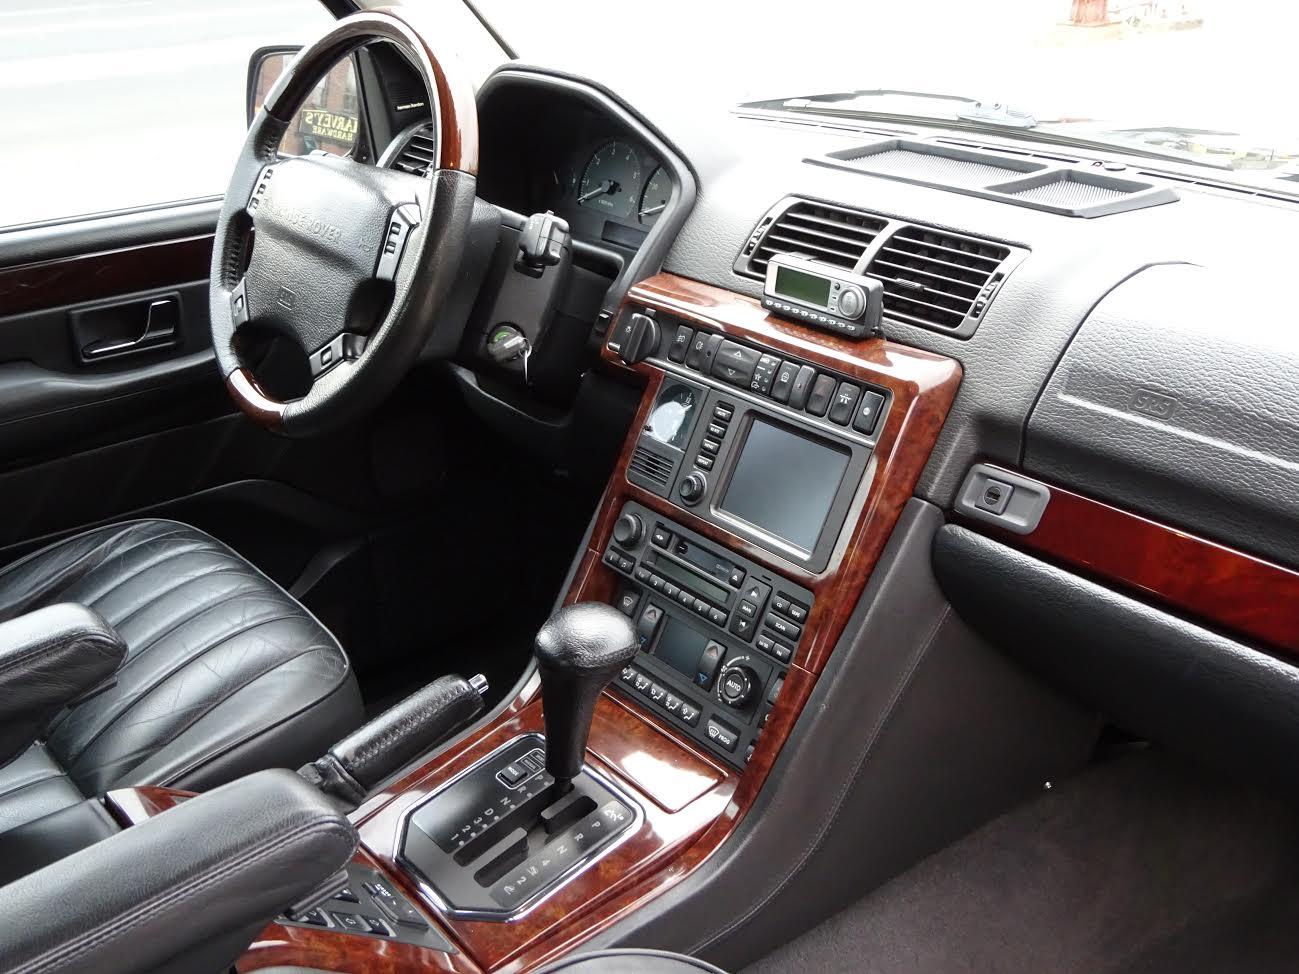 2001 Range Rover 4.6 HSE   Copley Motorcars